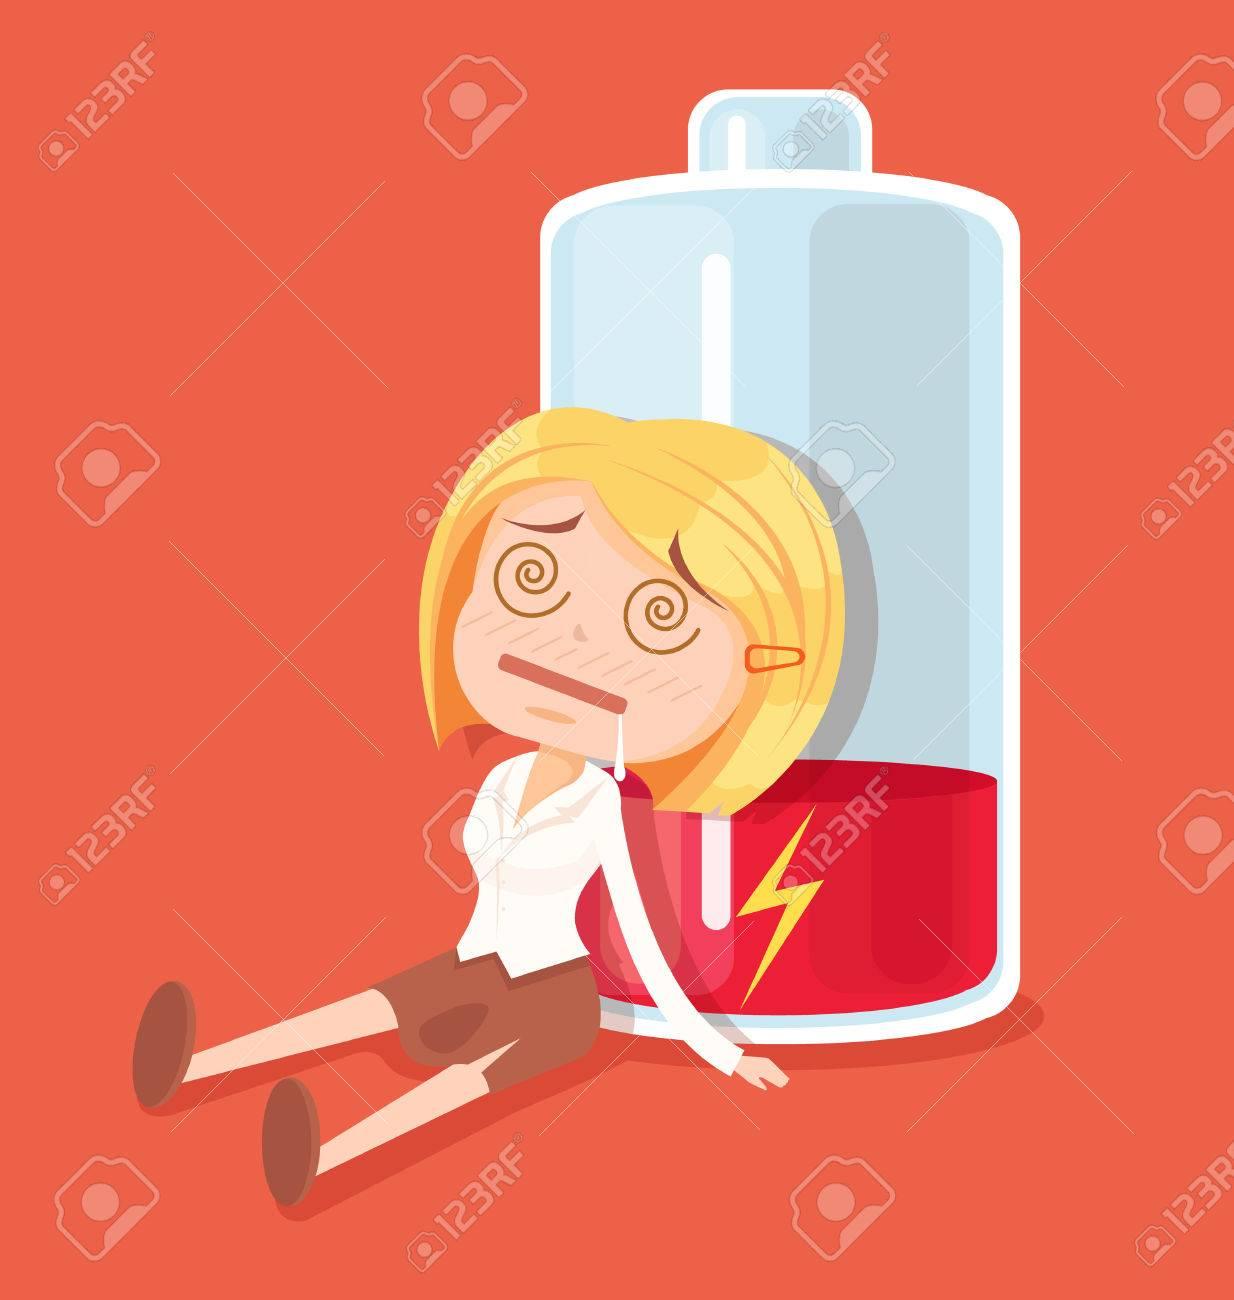 Business woman character no energy. Vector flat cartoon illustration - 62459643